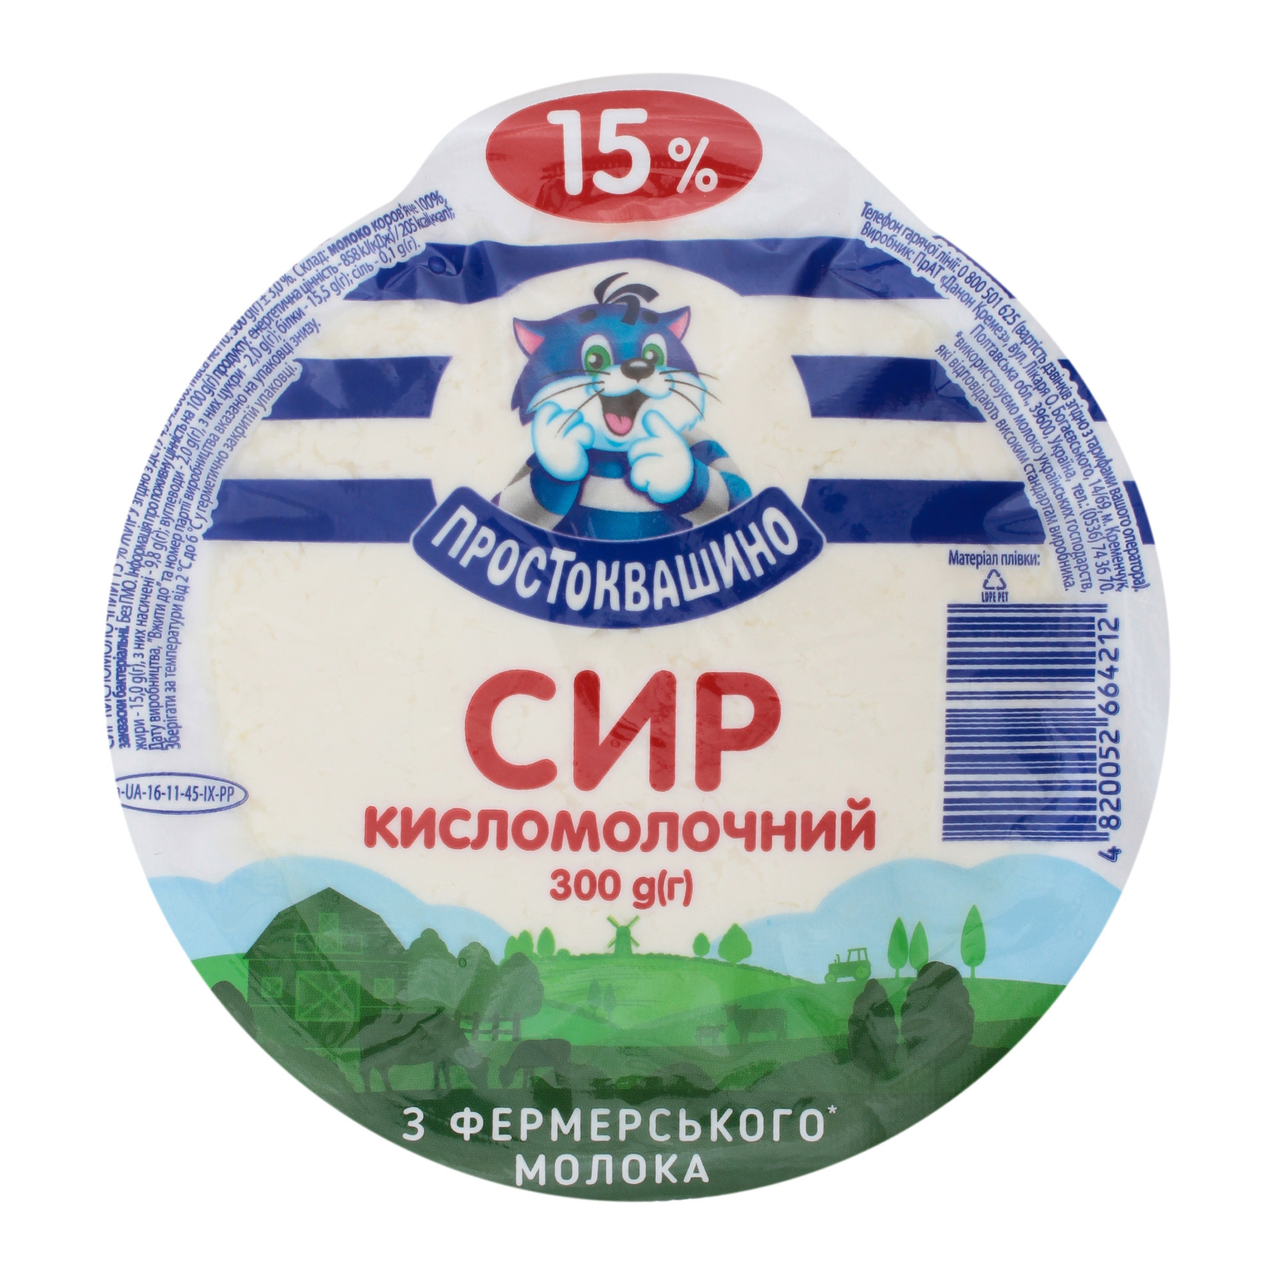 Сир кисломолочний Простоквашино 15% 300г